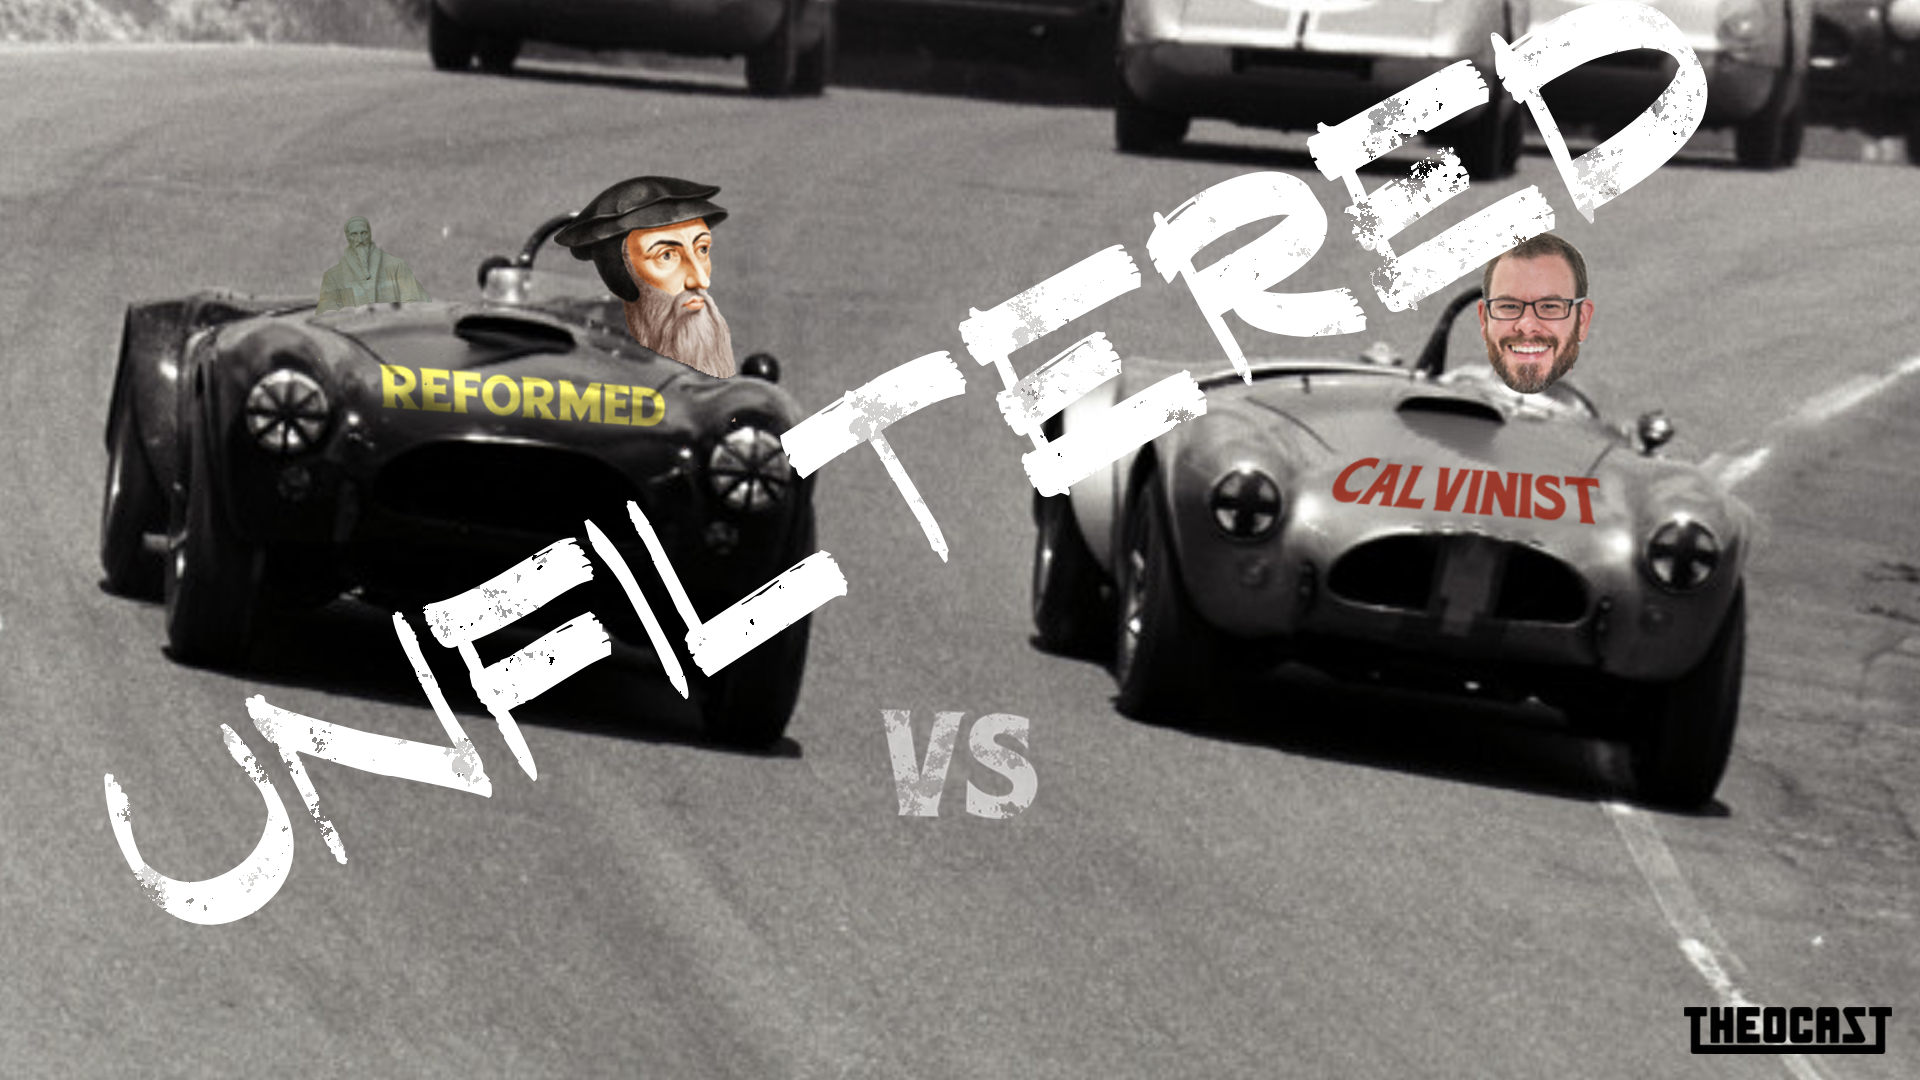 UNFILTERED #109 Calvinist vs Reformed